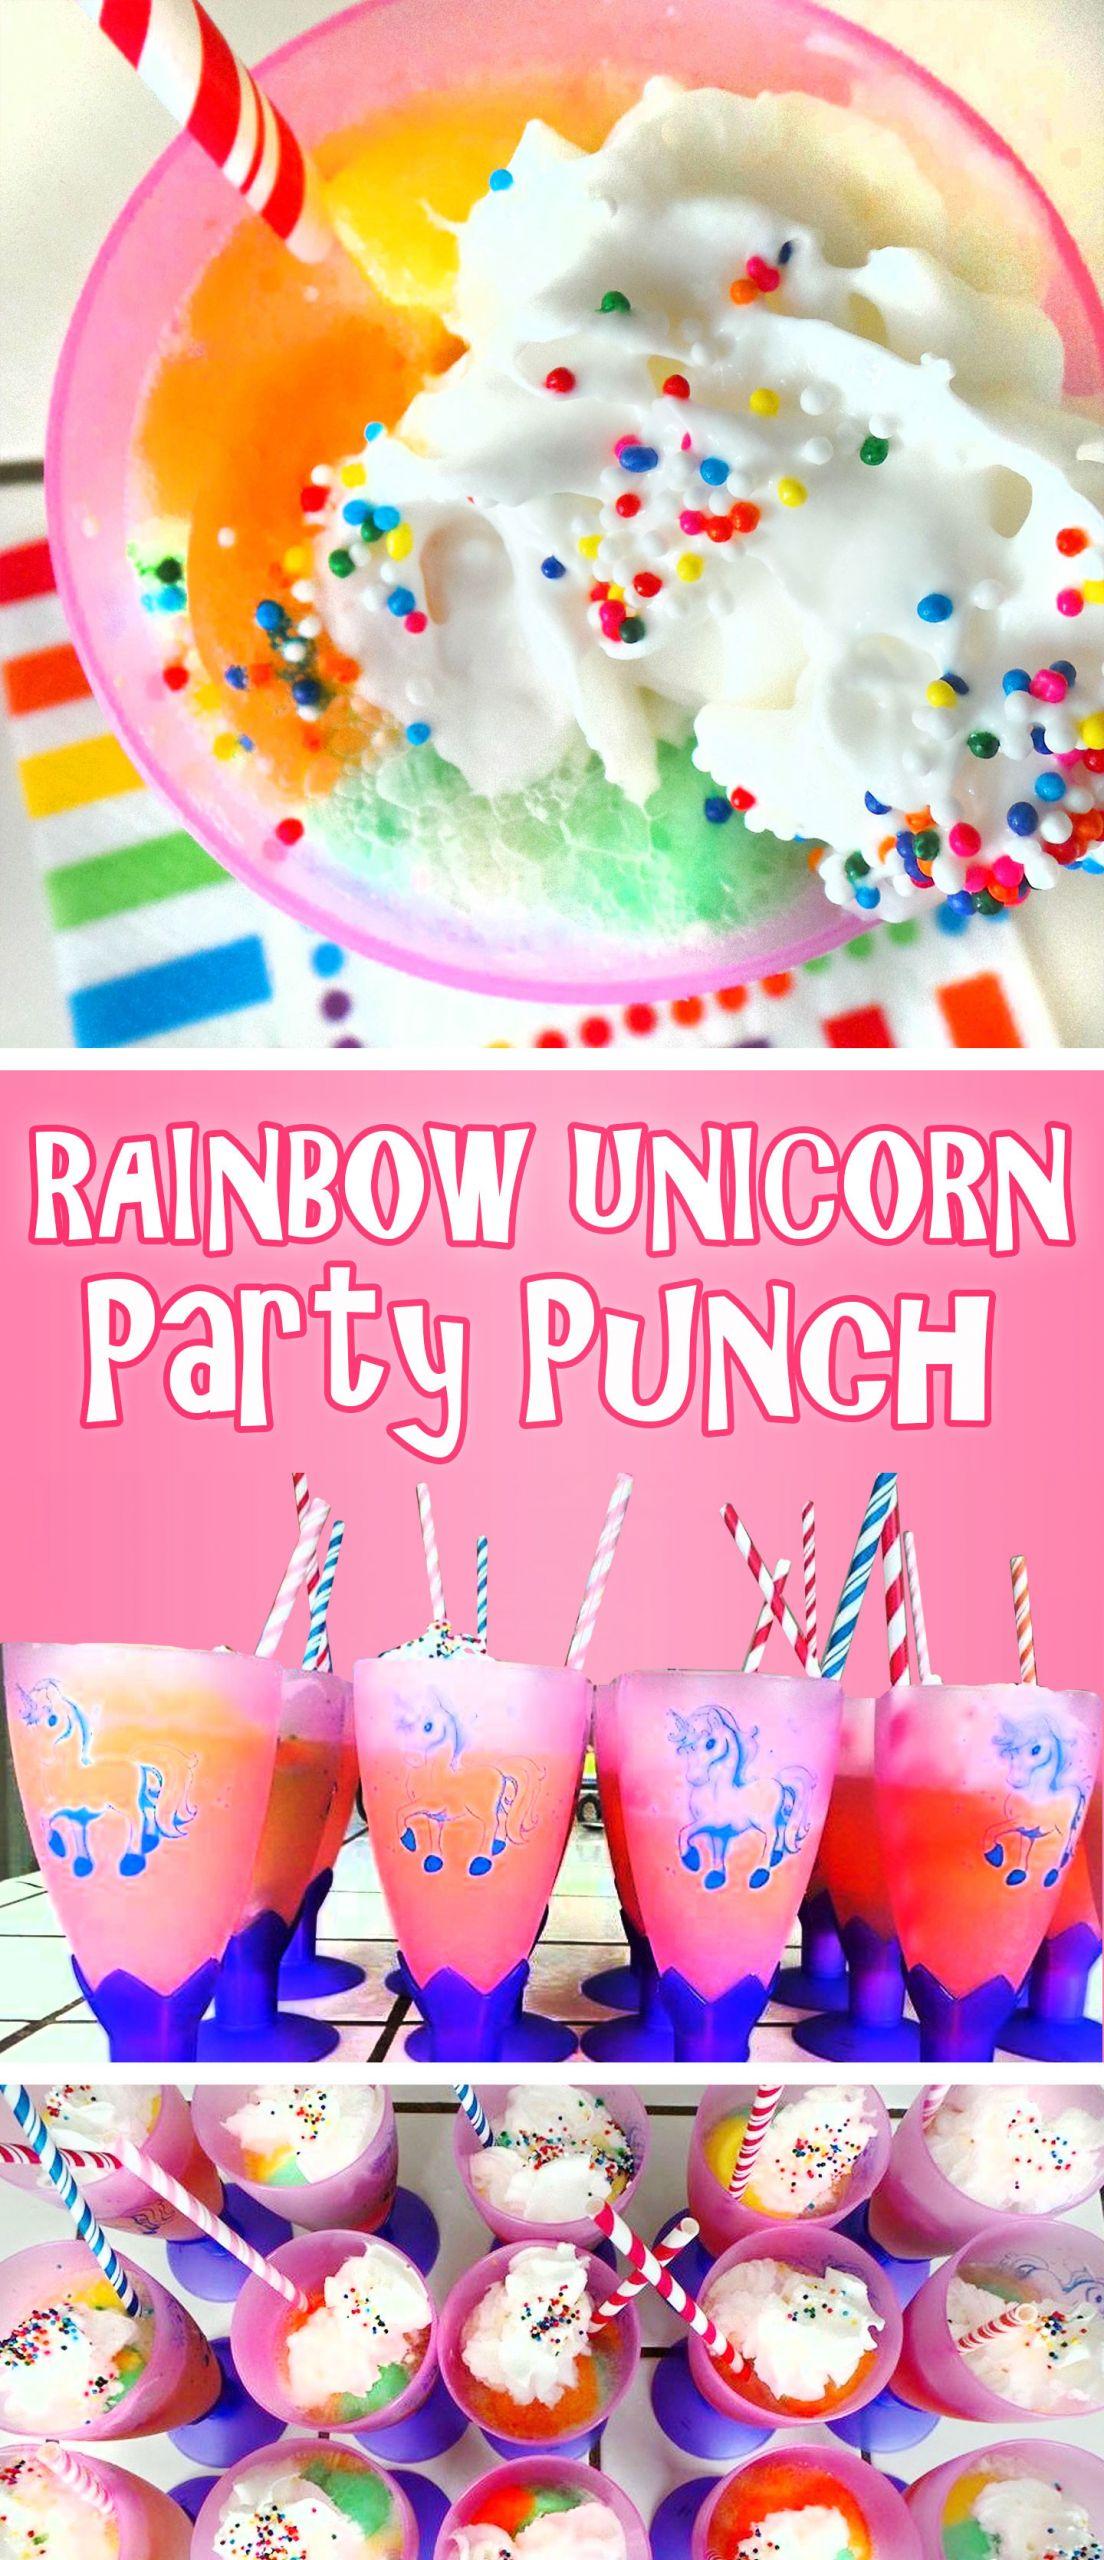 Unicorn Party Theme Food Ideas  Rainbow Unicorn Party Punch